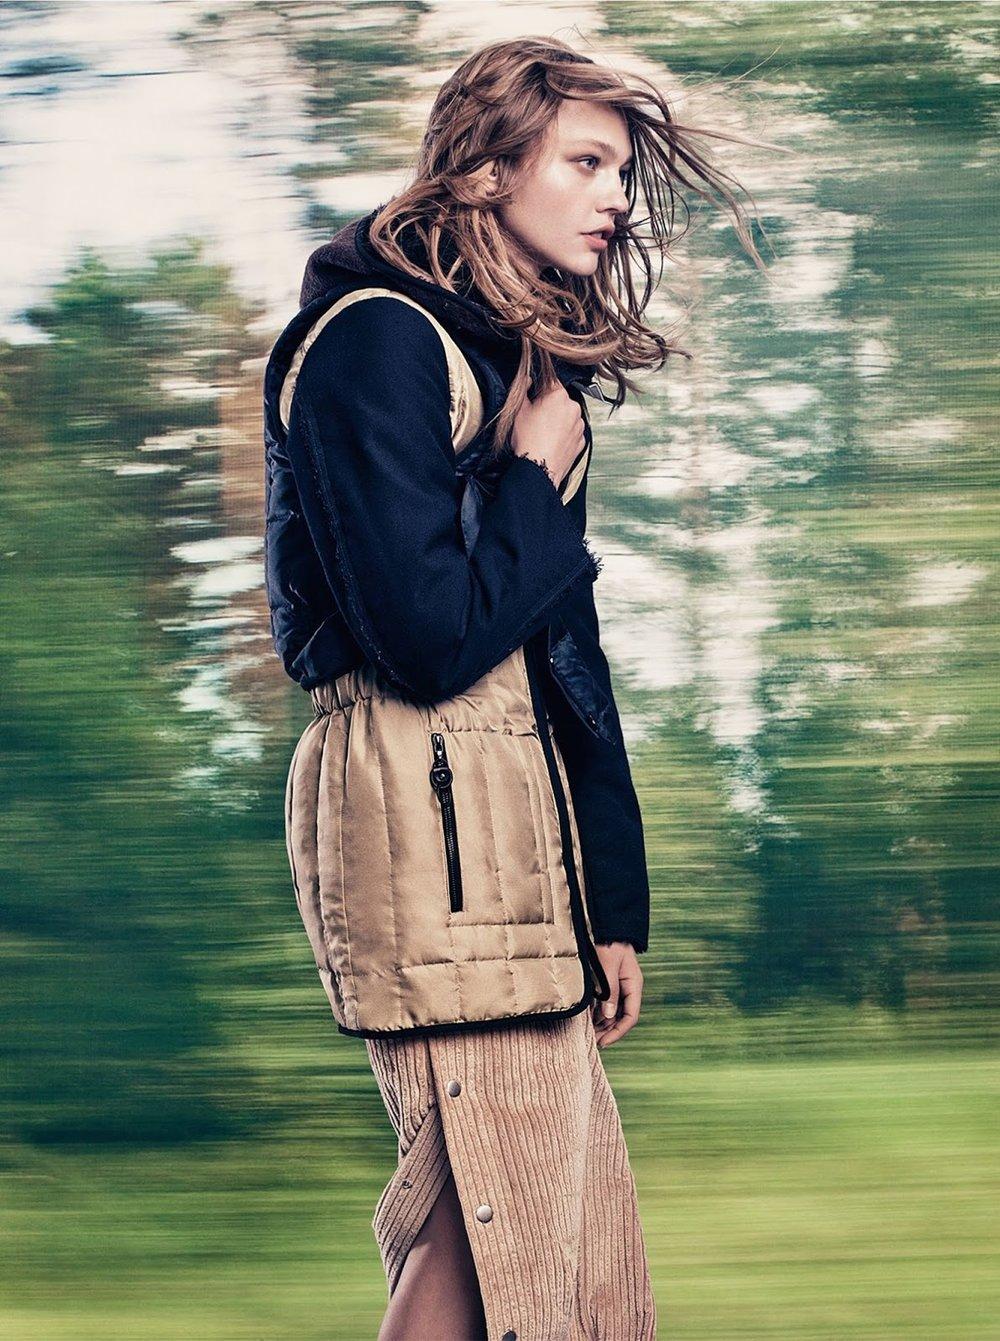 sasha-pivovarova-craig-mcdean-Vogue UK OCT 2016 -  (4).jpg